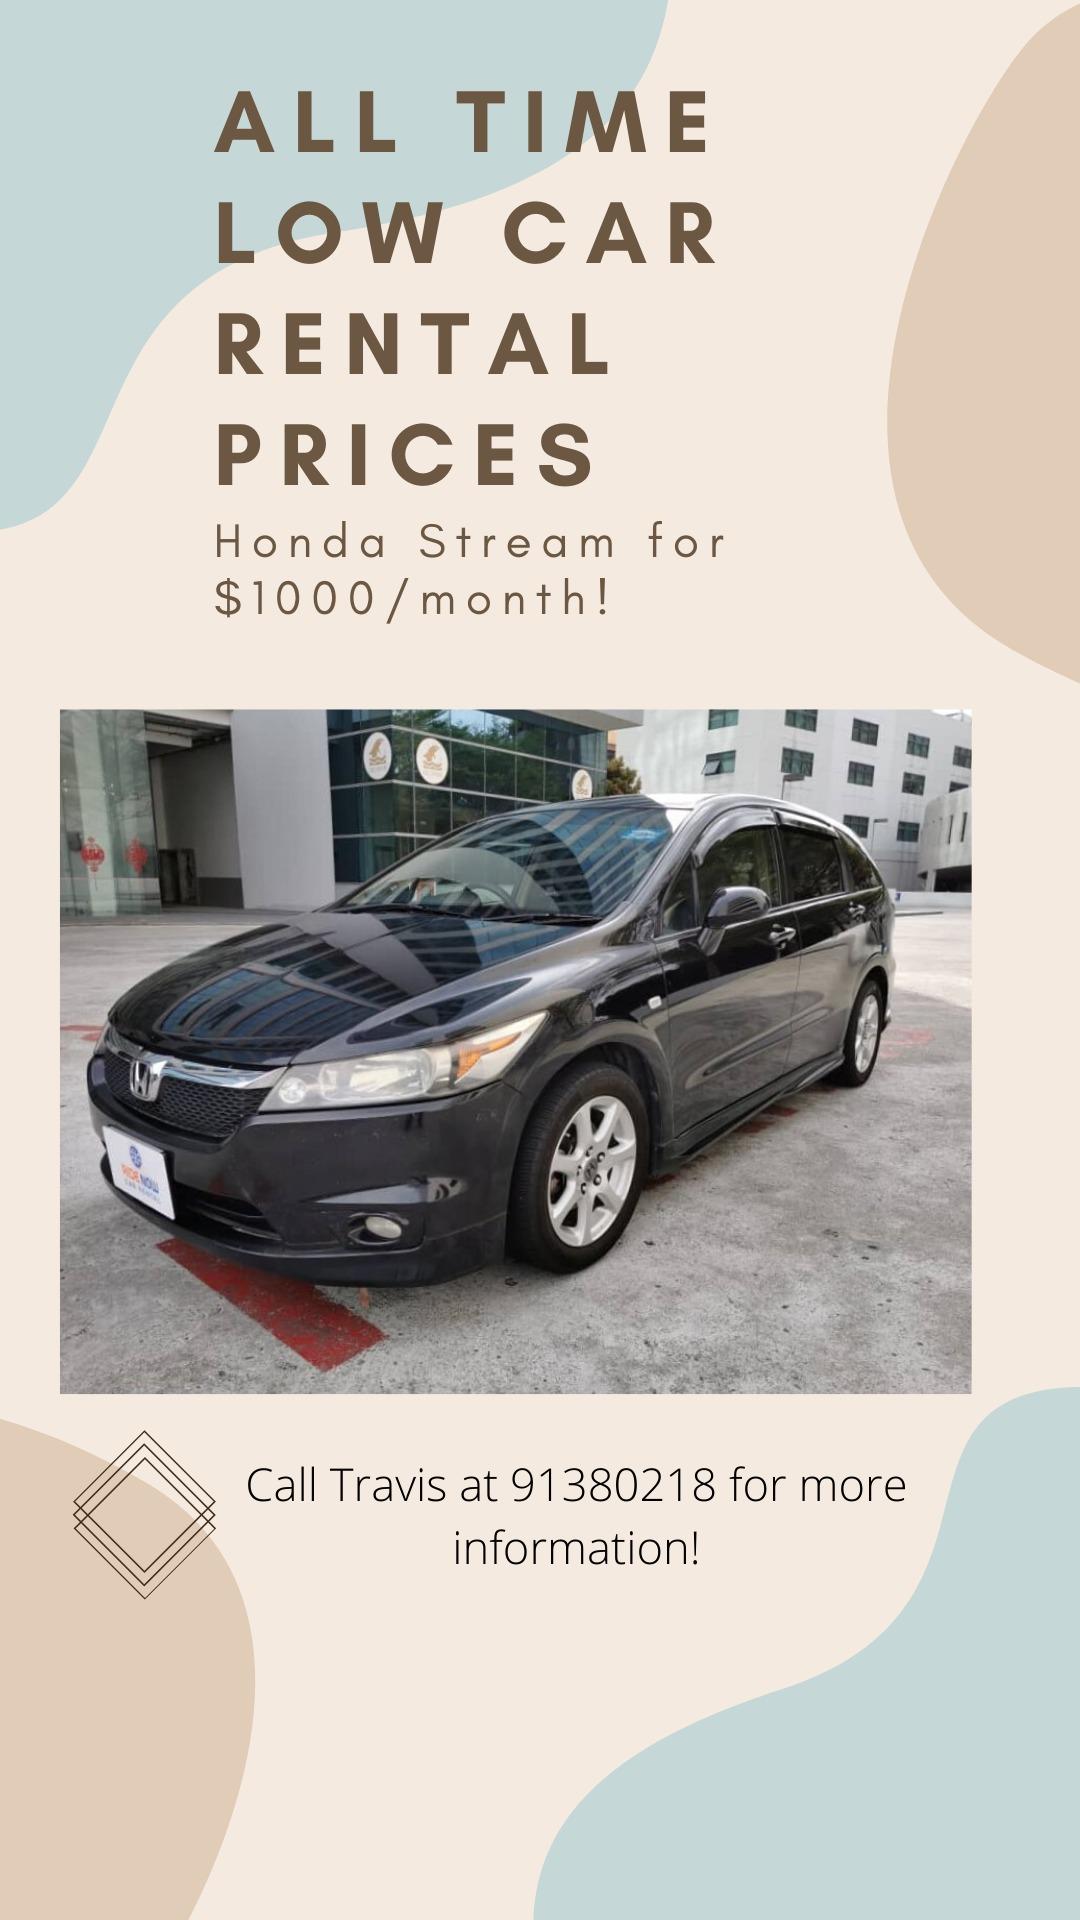 Honda Stream 1.8A MPV Cheapest Car Rental Prices Ever! Check with us now!